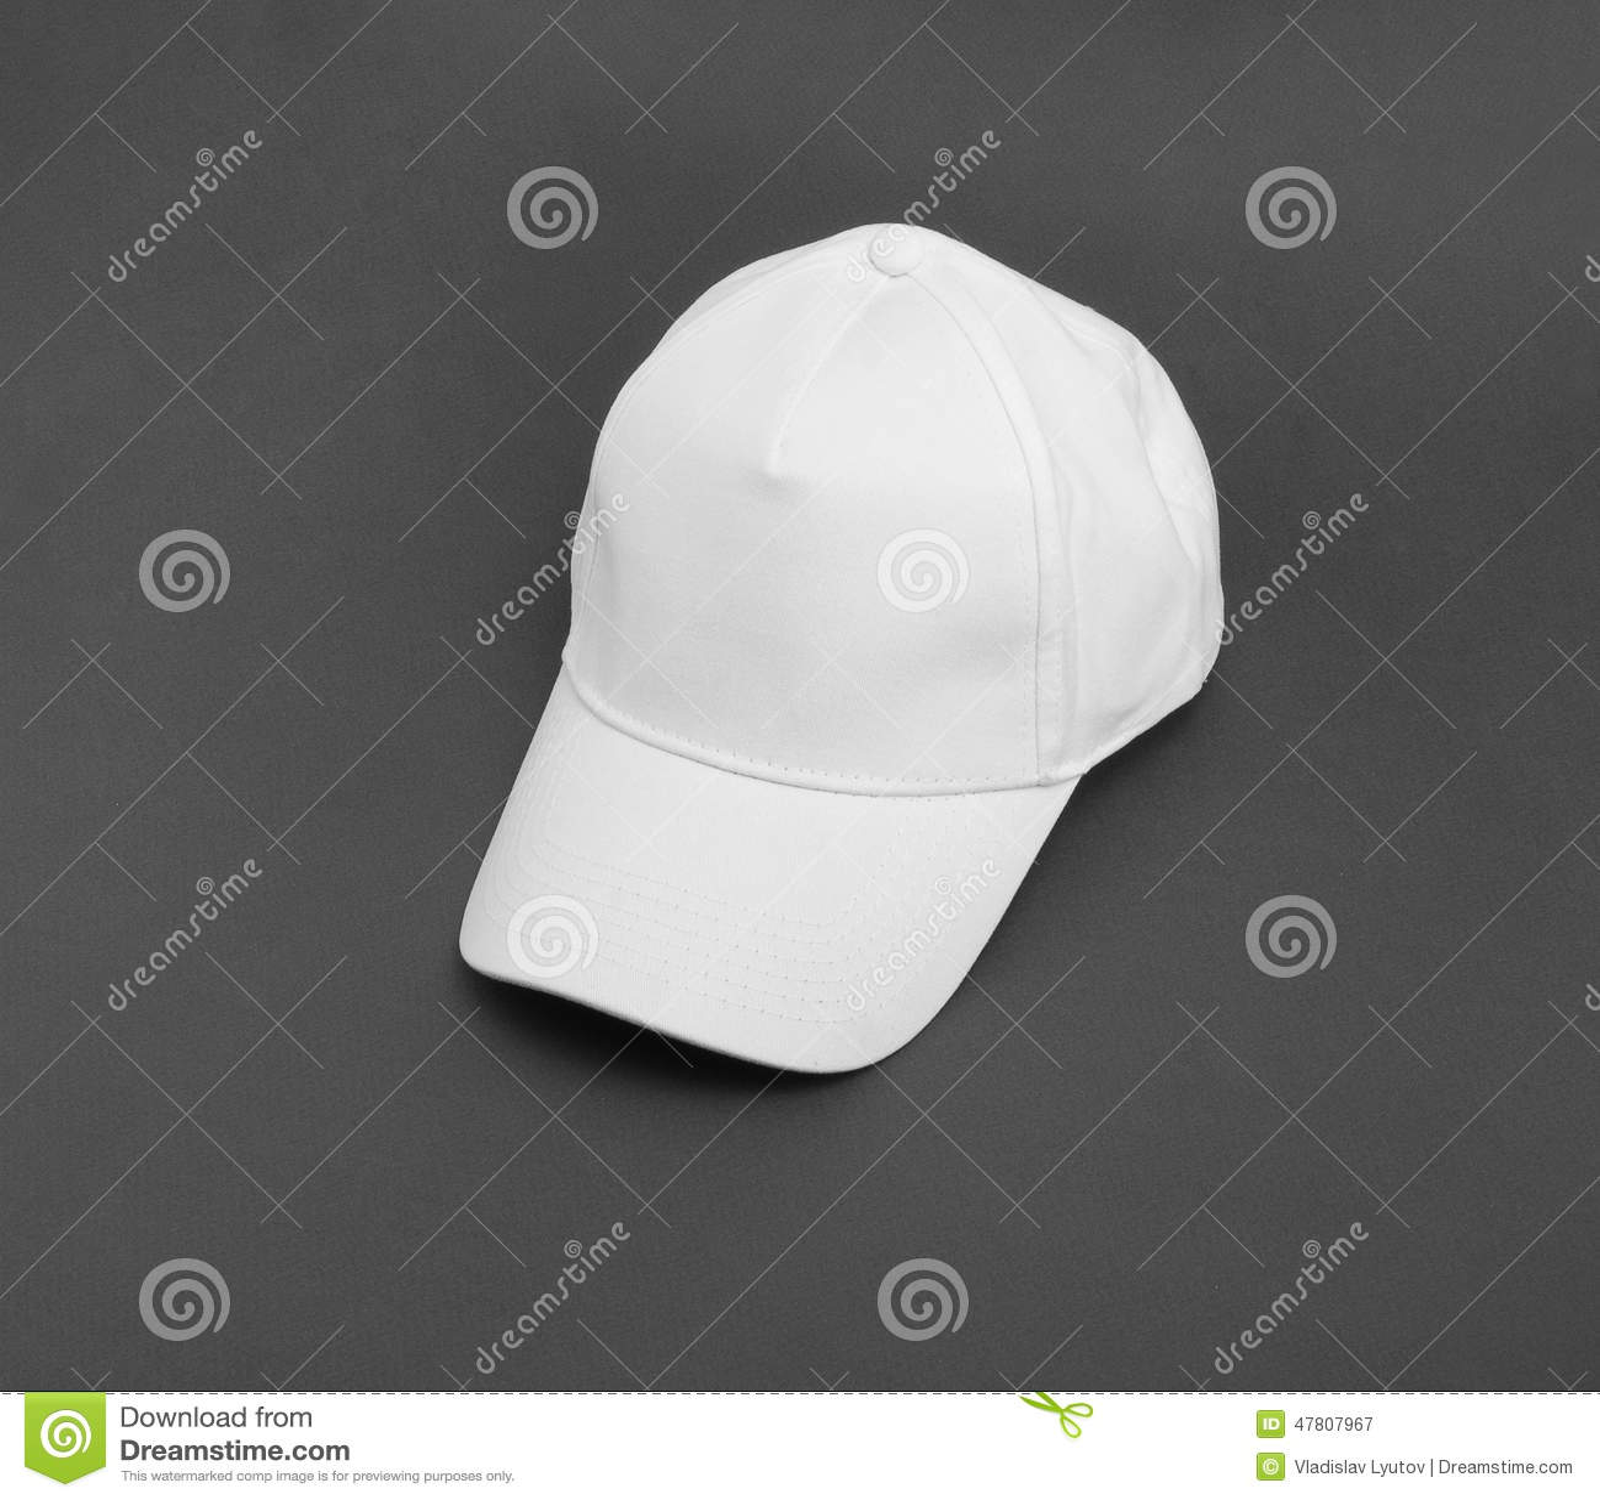 how to clean a white baseball cap